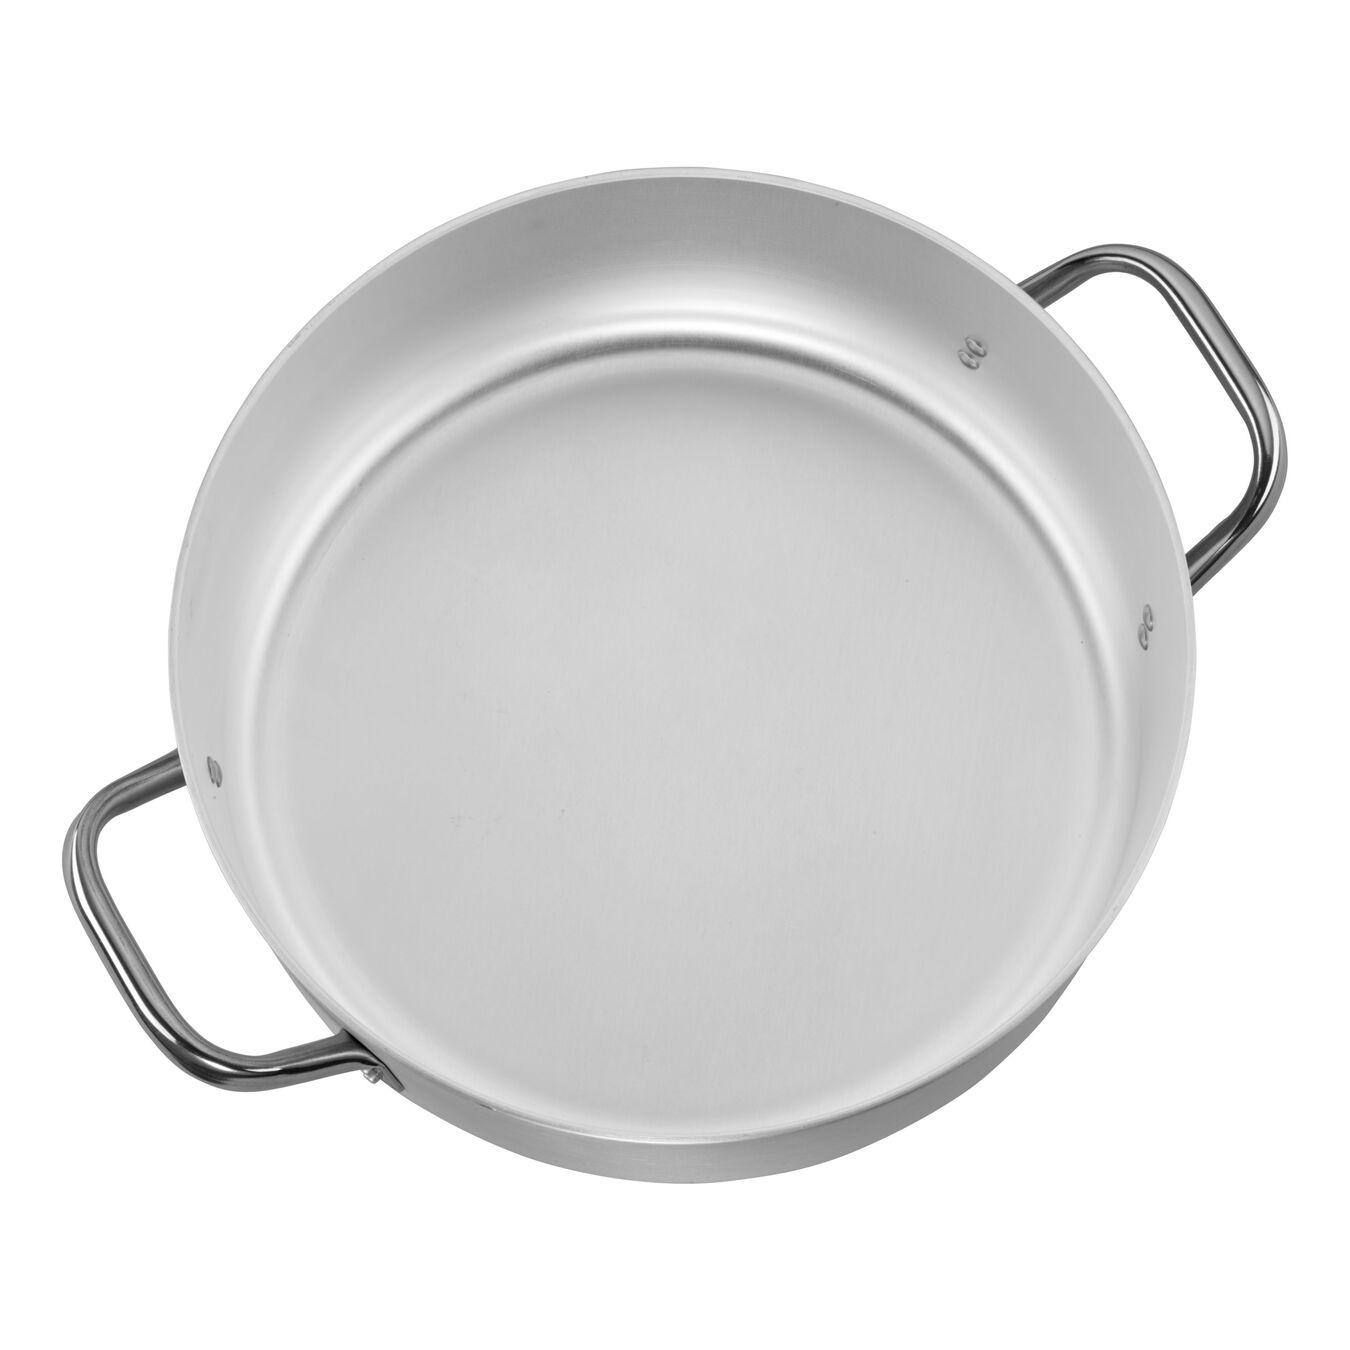 17.5-qt Aluminum Braiser,,large 1